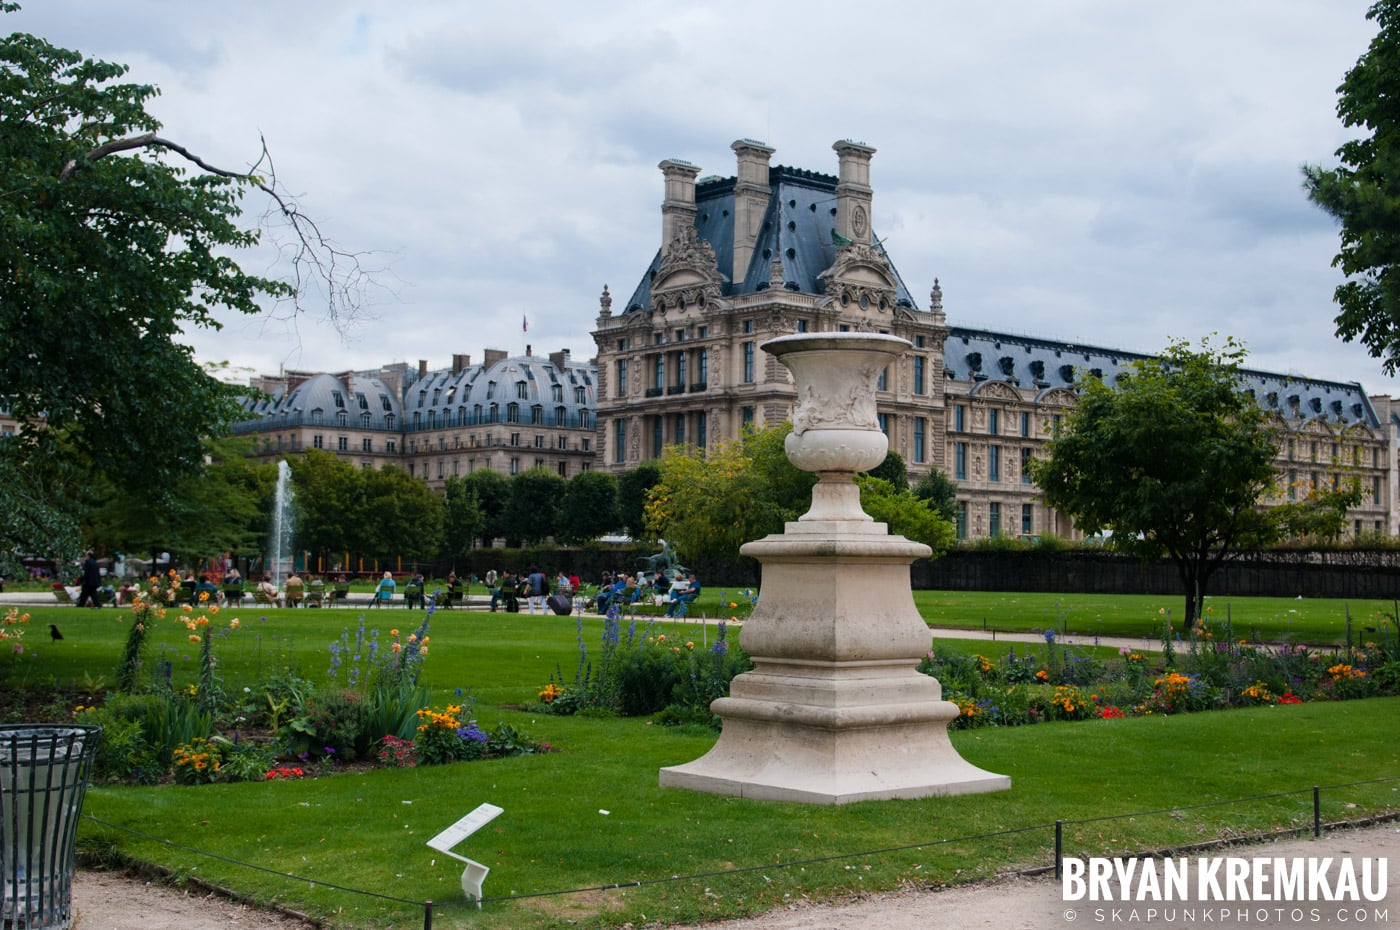 Paris, France Honeymoon - Day 3 - 7.20.11 (45)